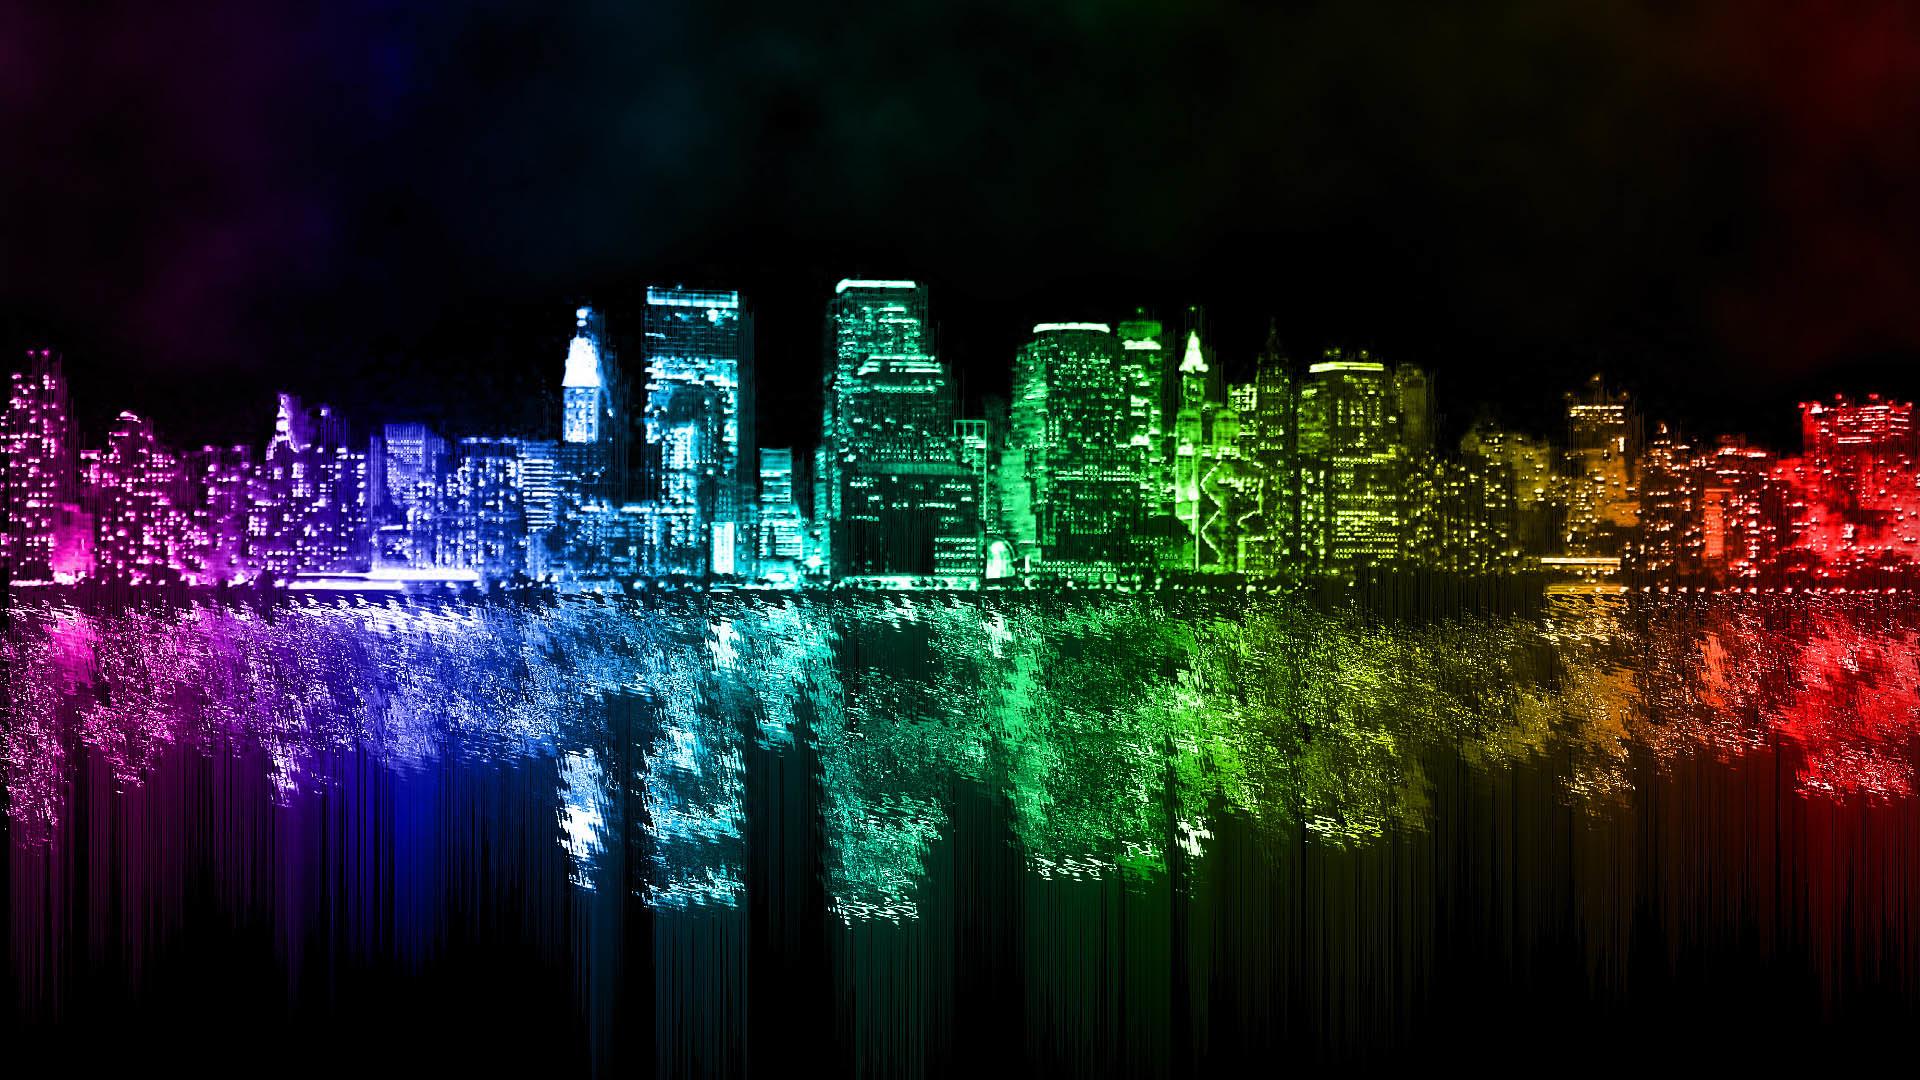 1920x1200 Great Brisbane City Hd Wallpaper Cityscapes Night